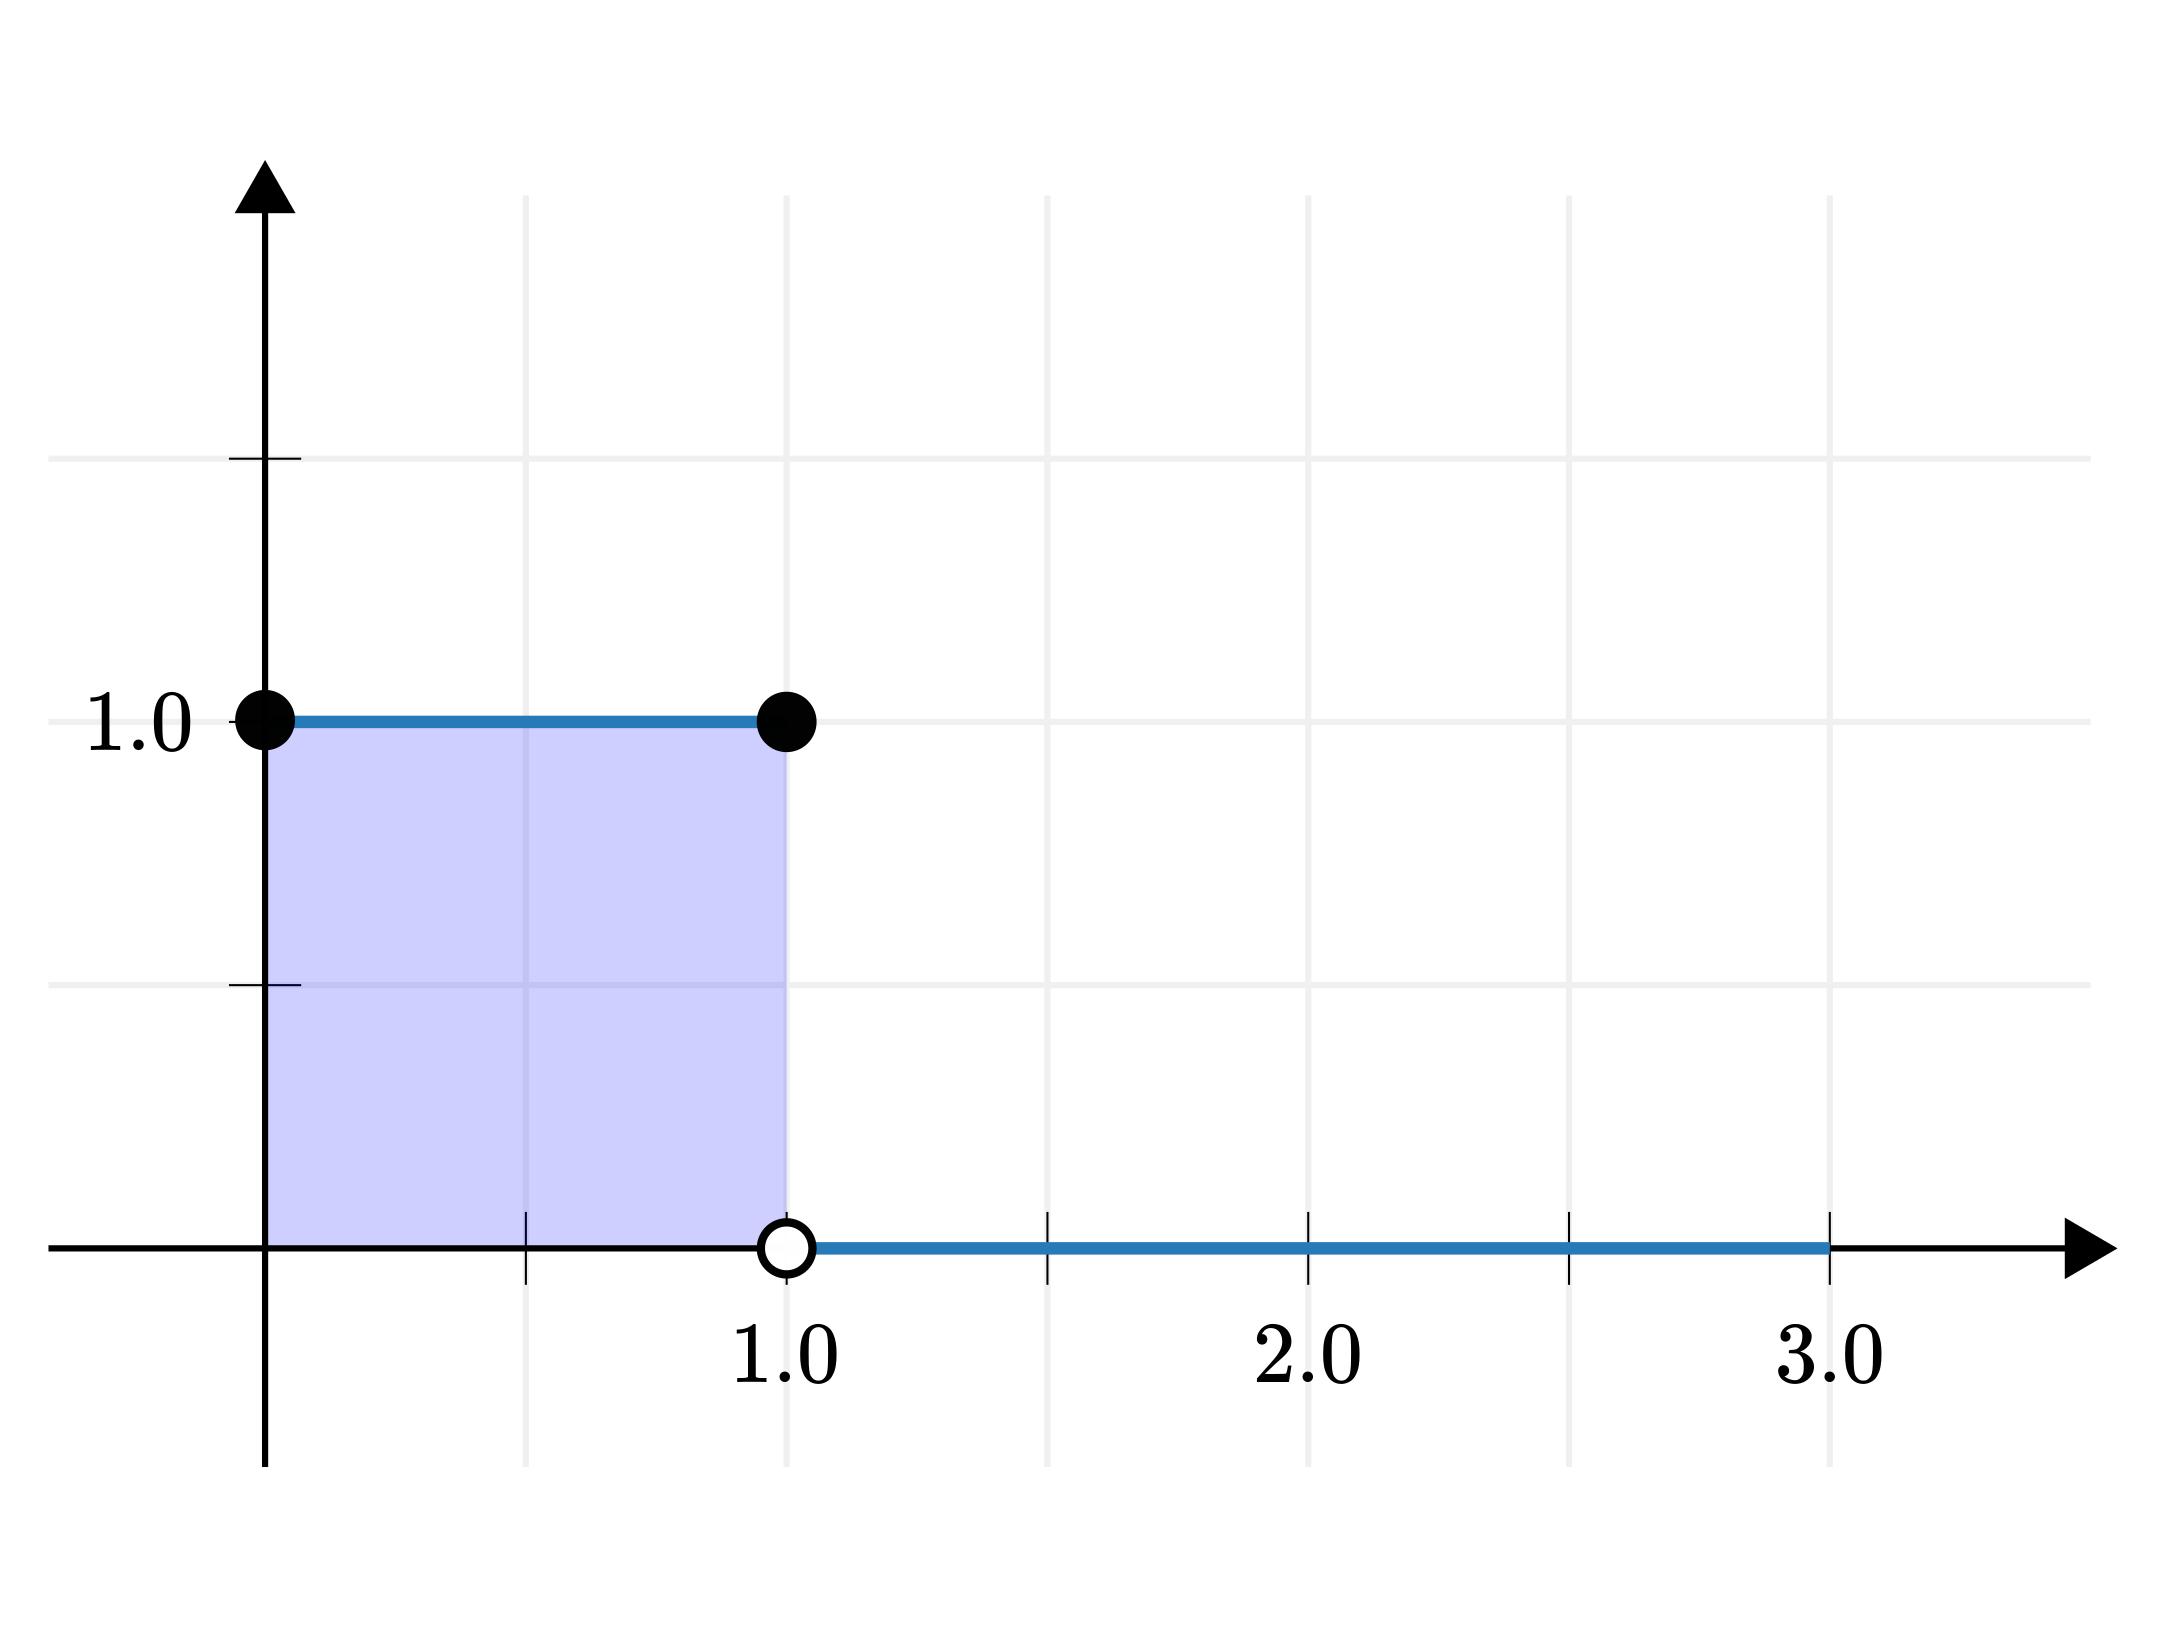 the uniform distribution